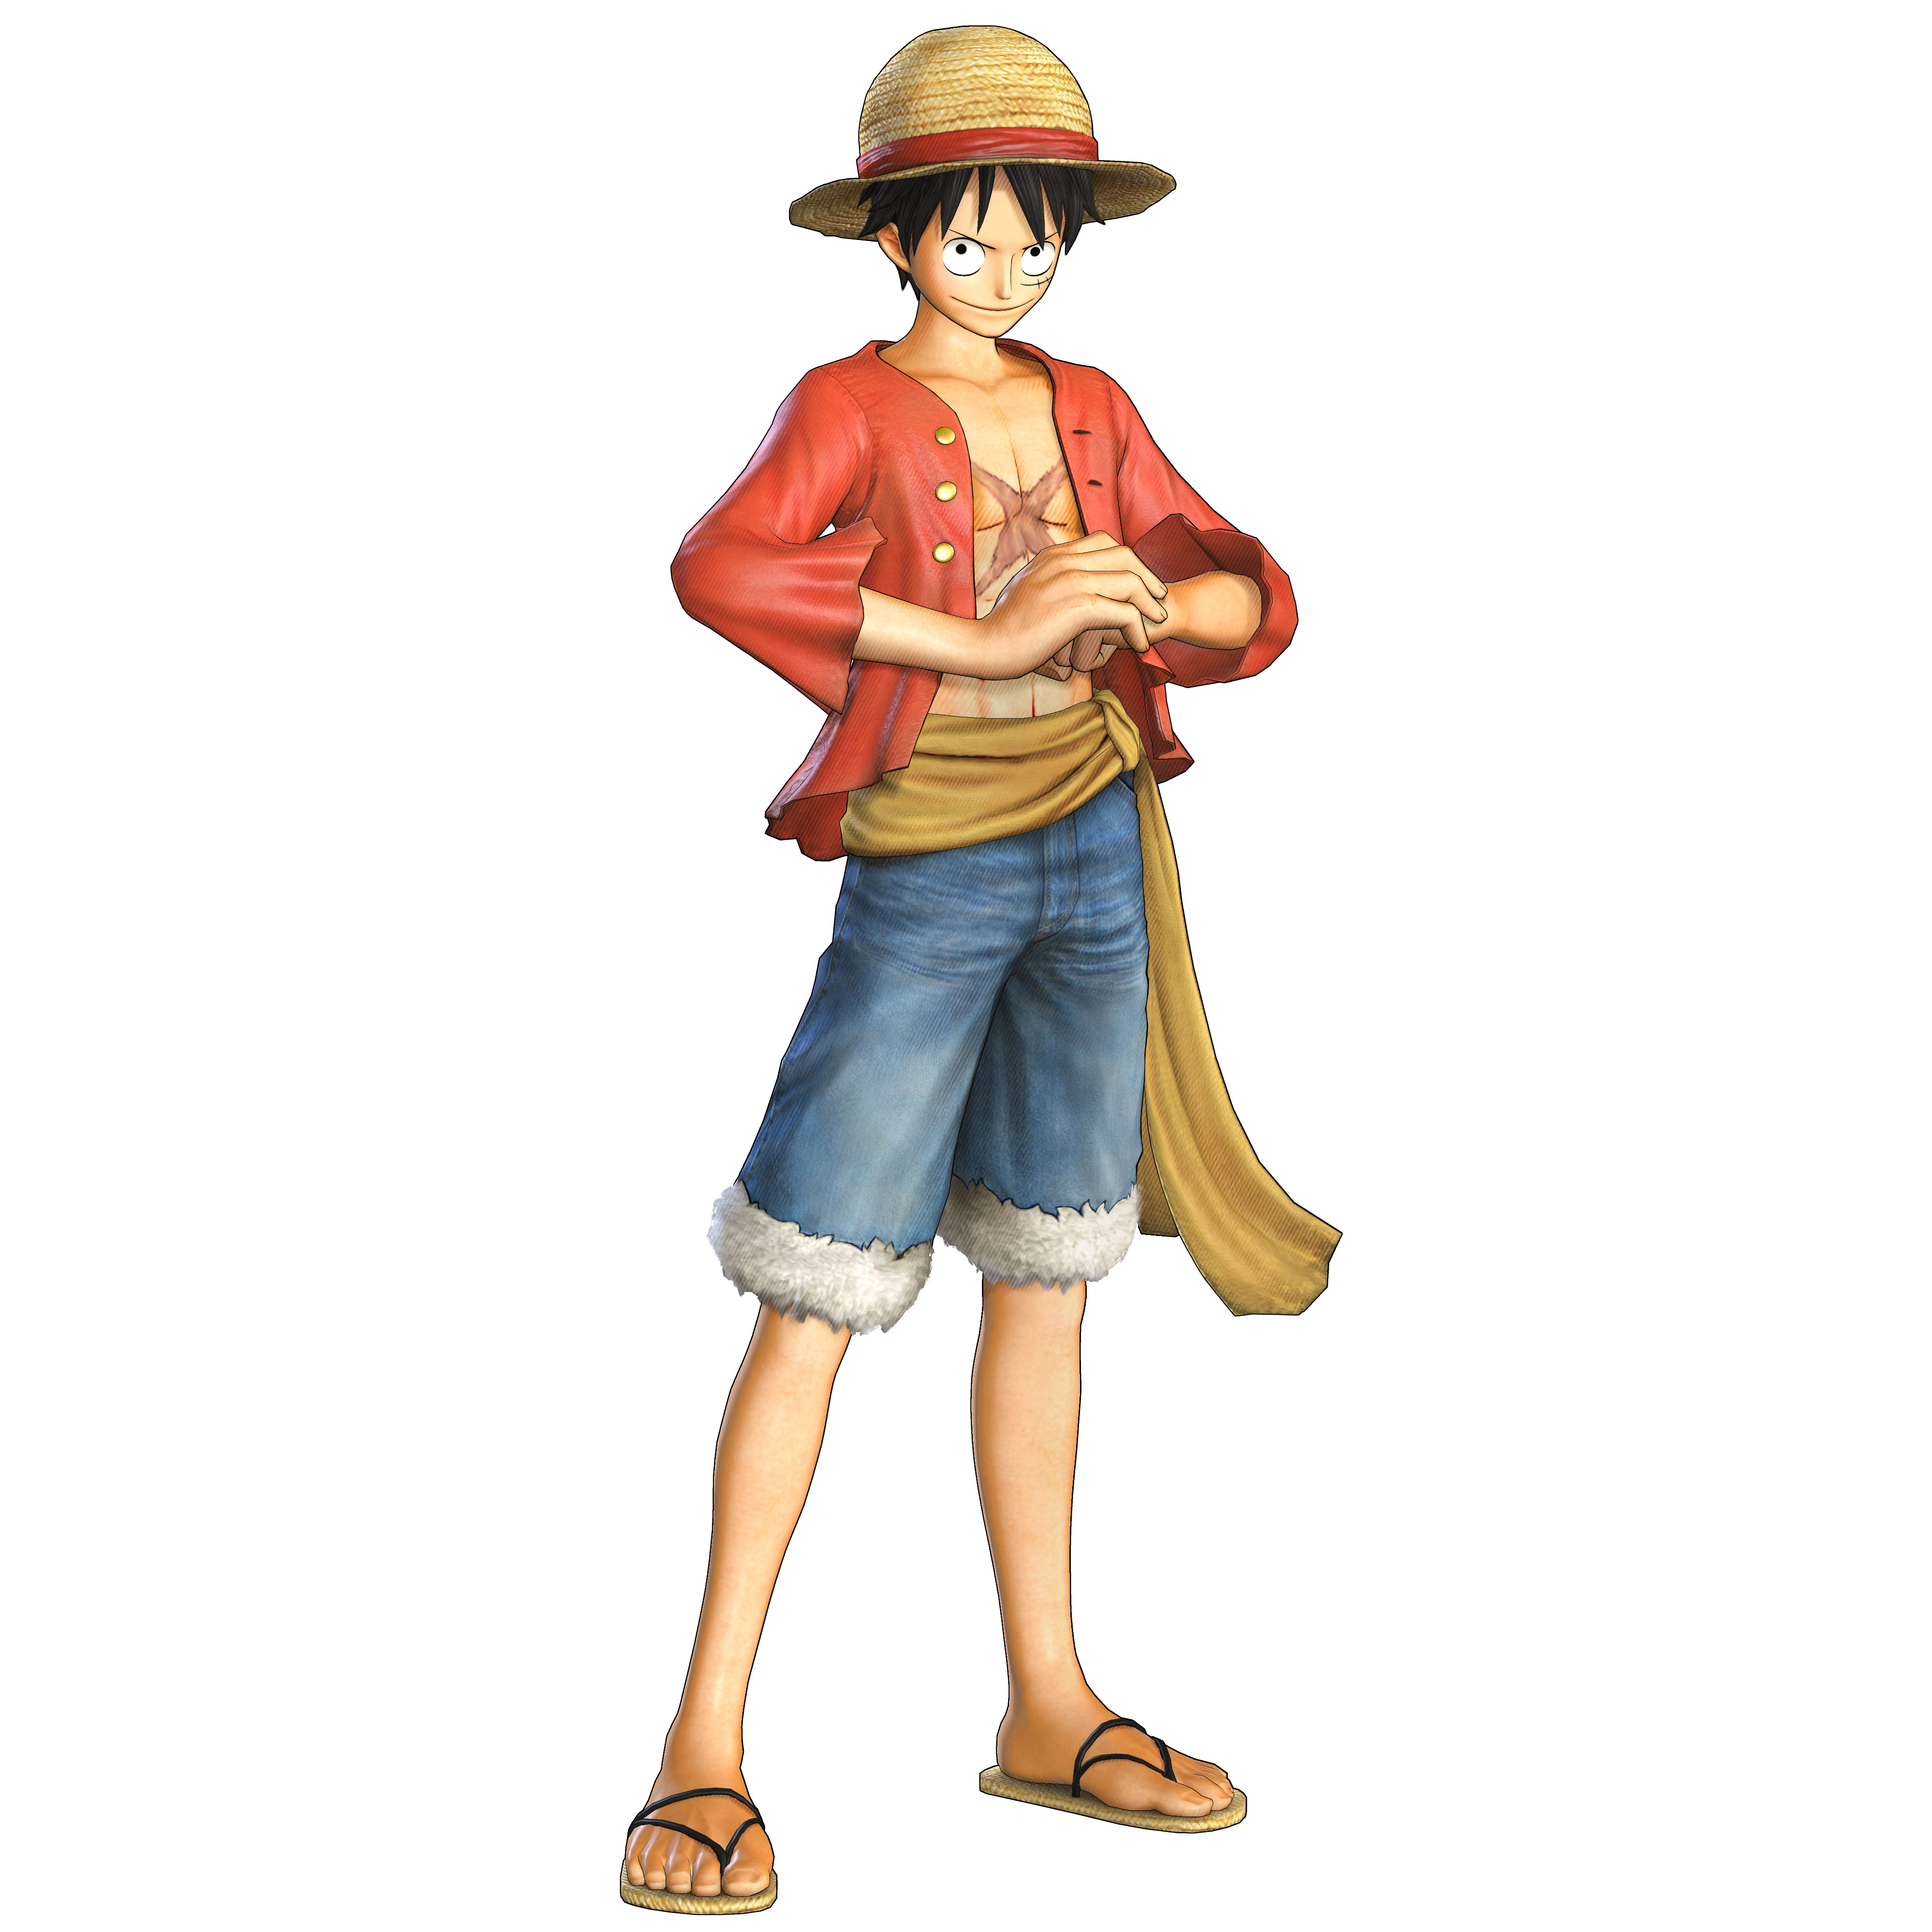 Monkey D. Luffy - ONE PIECE - Image #2621230 - Zerochan